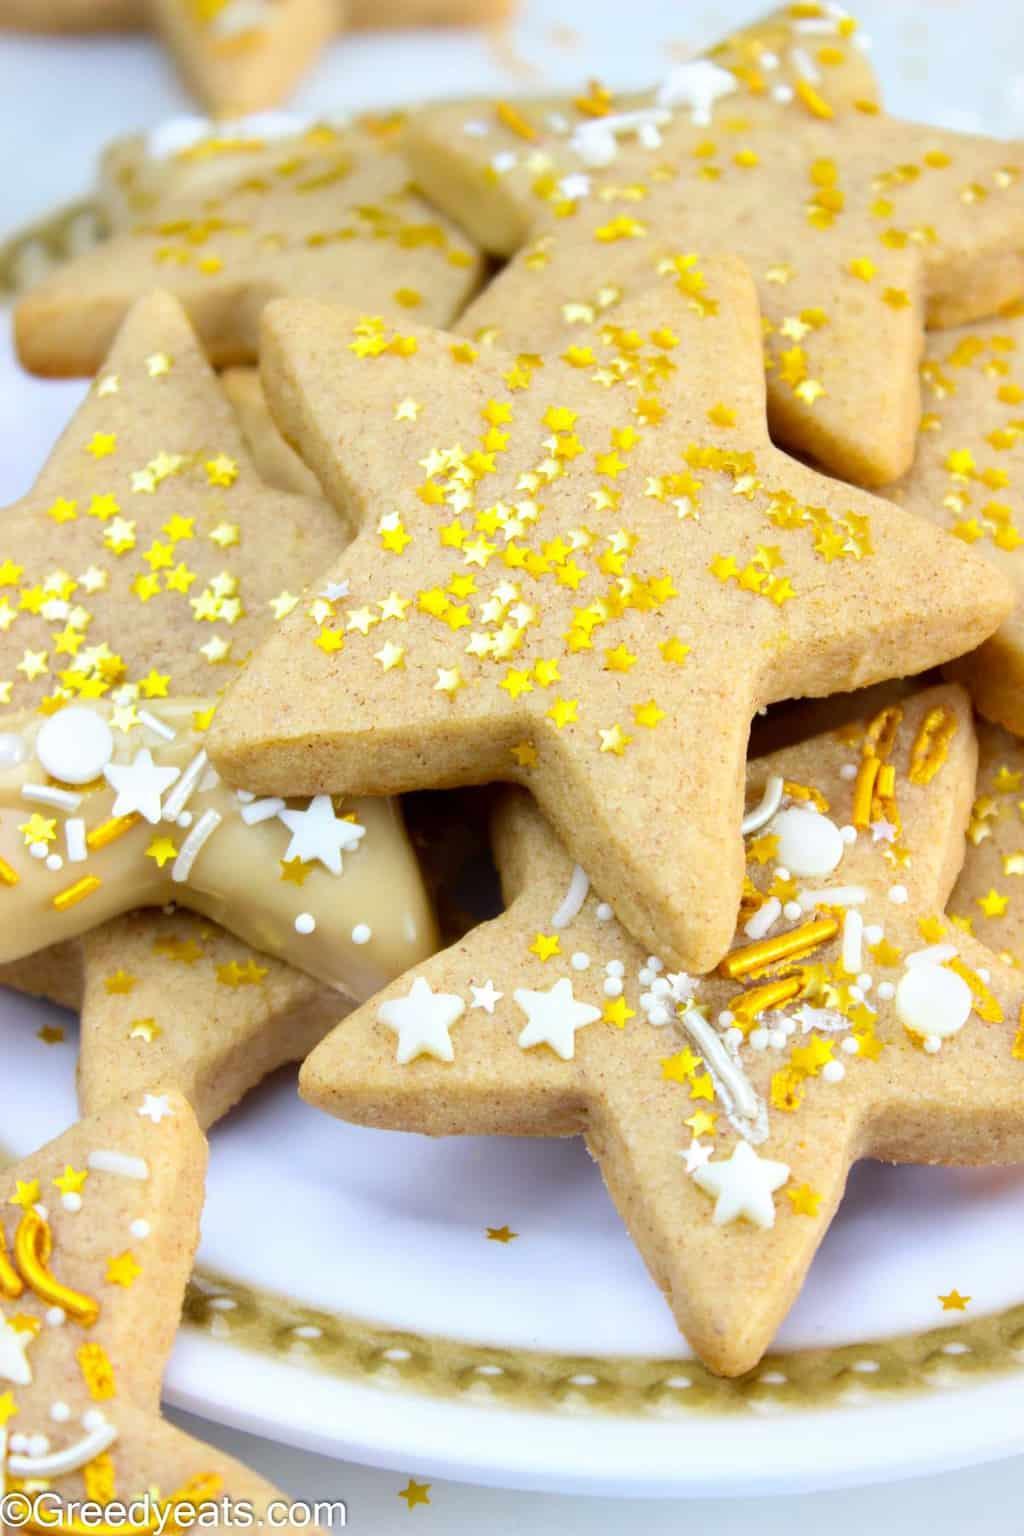 Easy Cinnamon Sugar Star Cookies recipe on Greedyeats.com